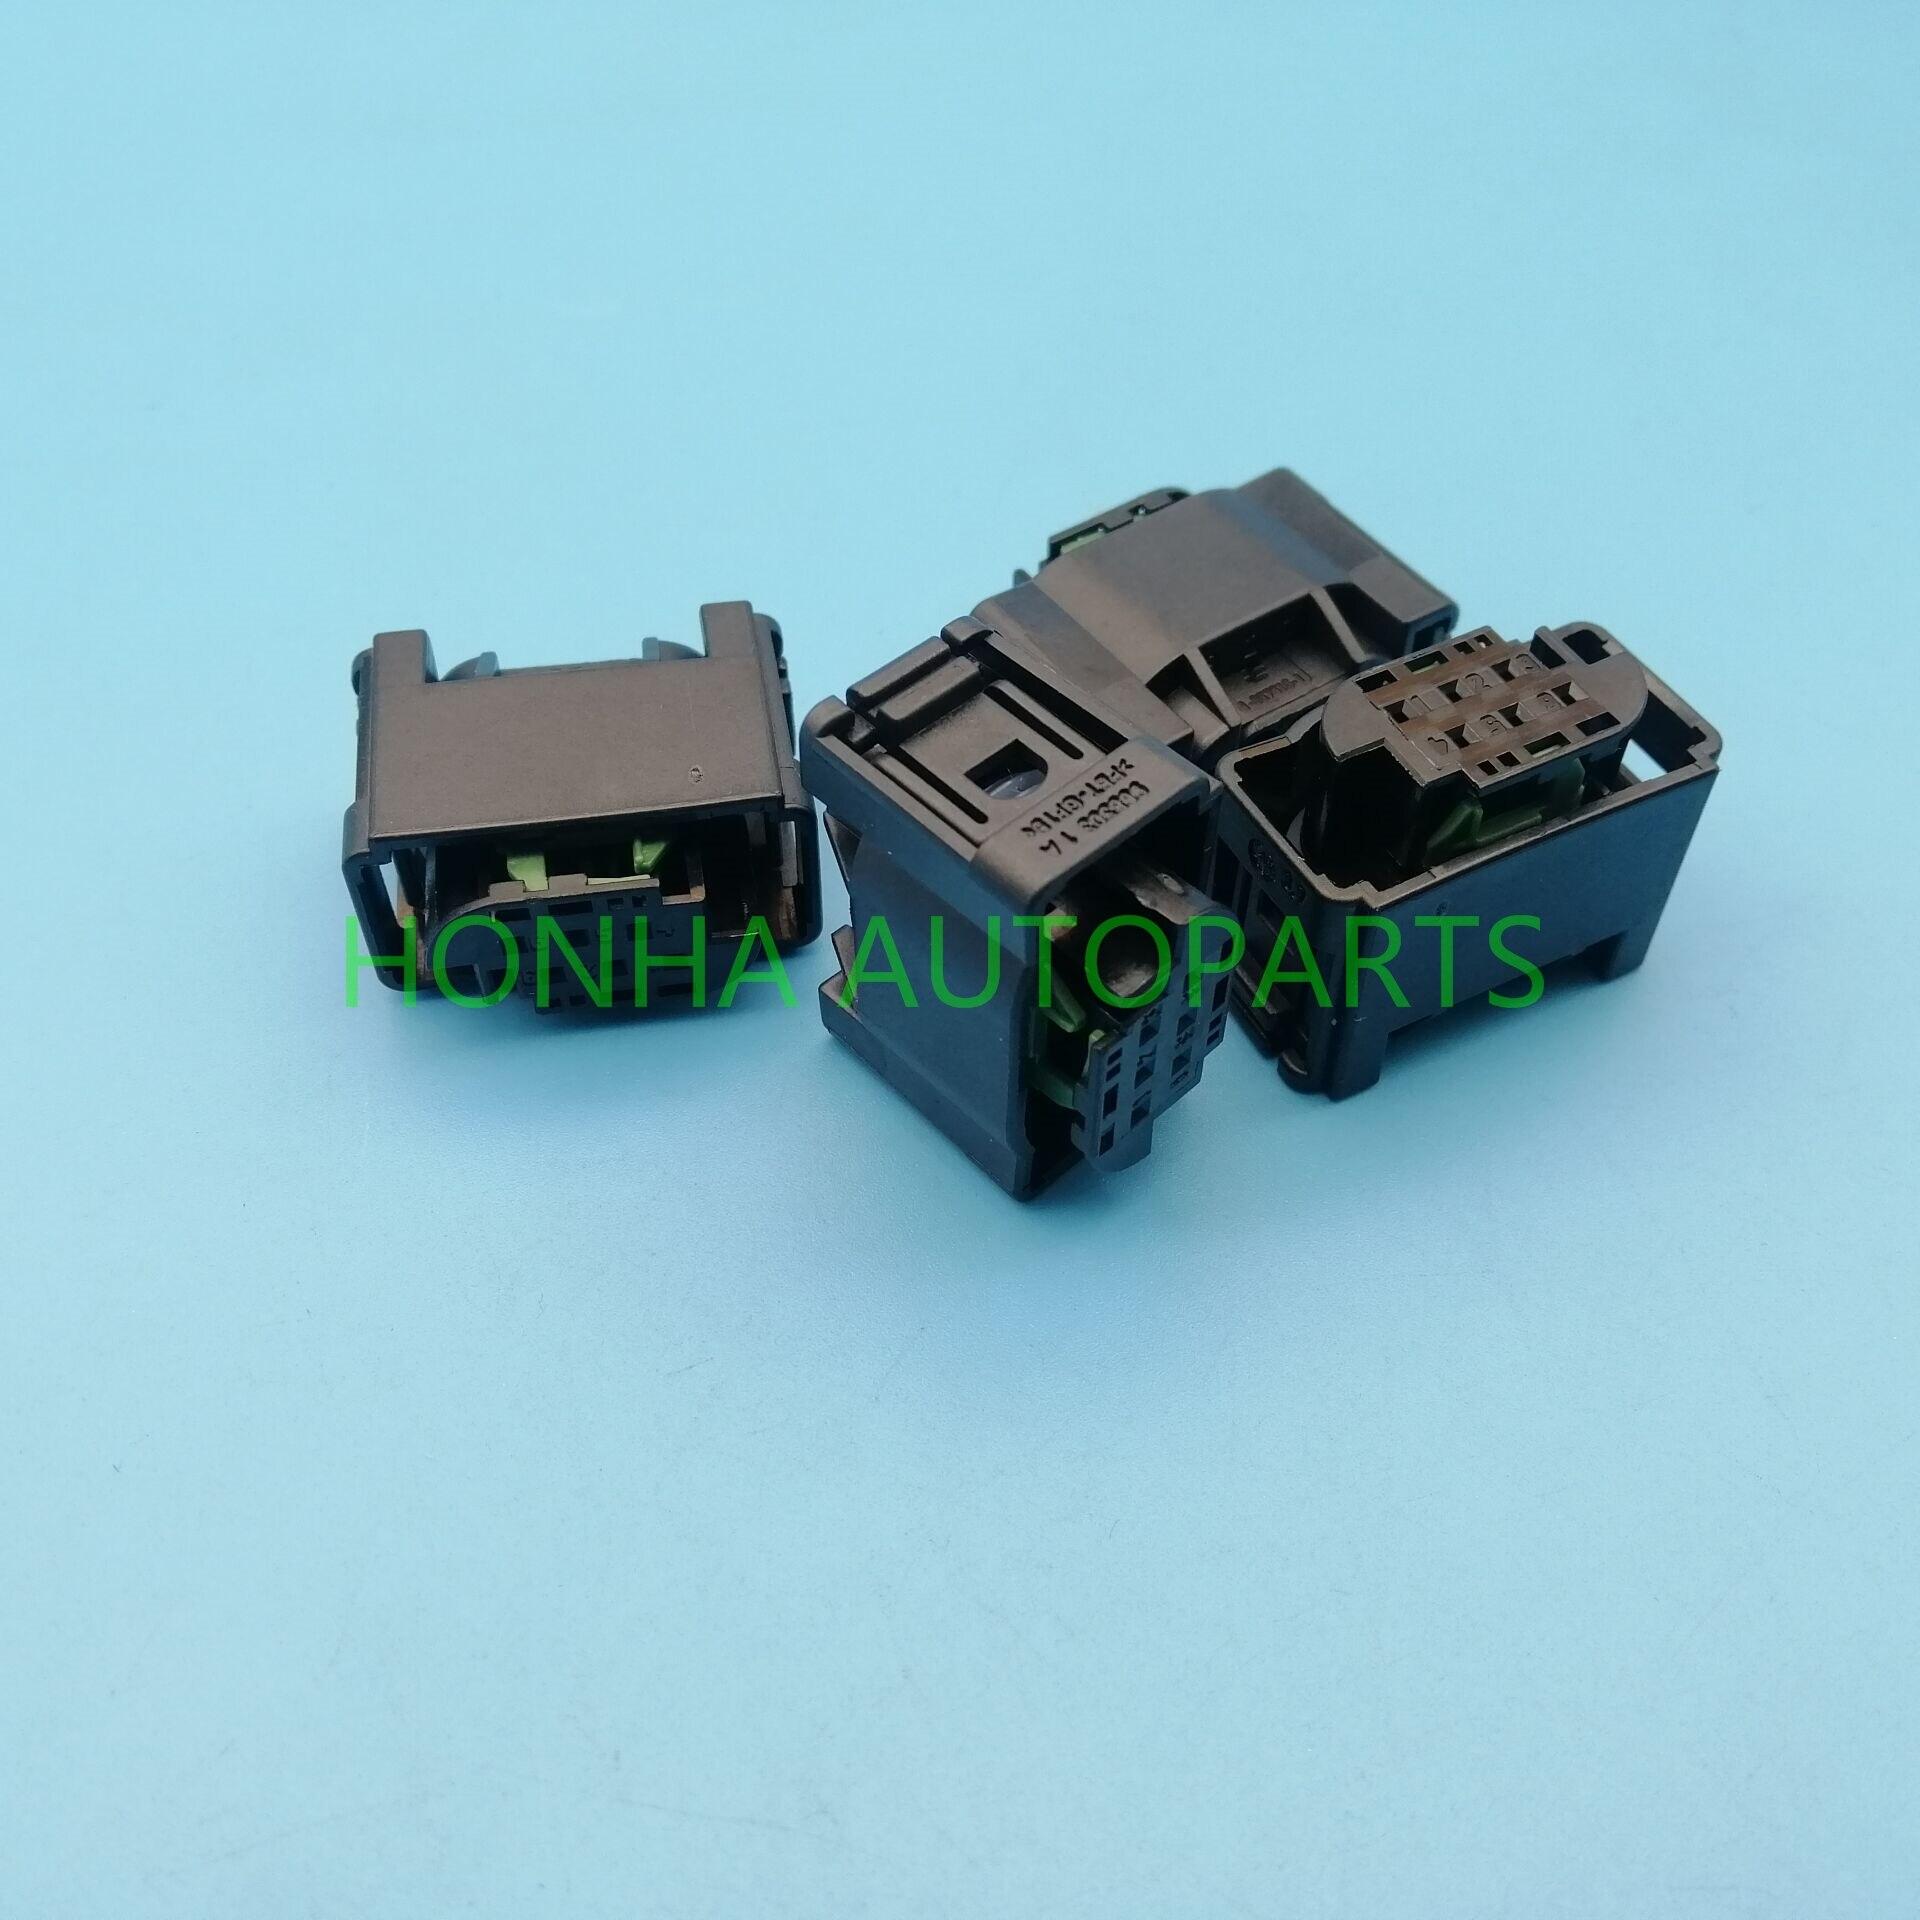 5 Pcs 6 Pins Ways For Tyco Accelerator Pedal Plug 968303-1 7M0 973 119 Throttle Valve Sensor Connector